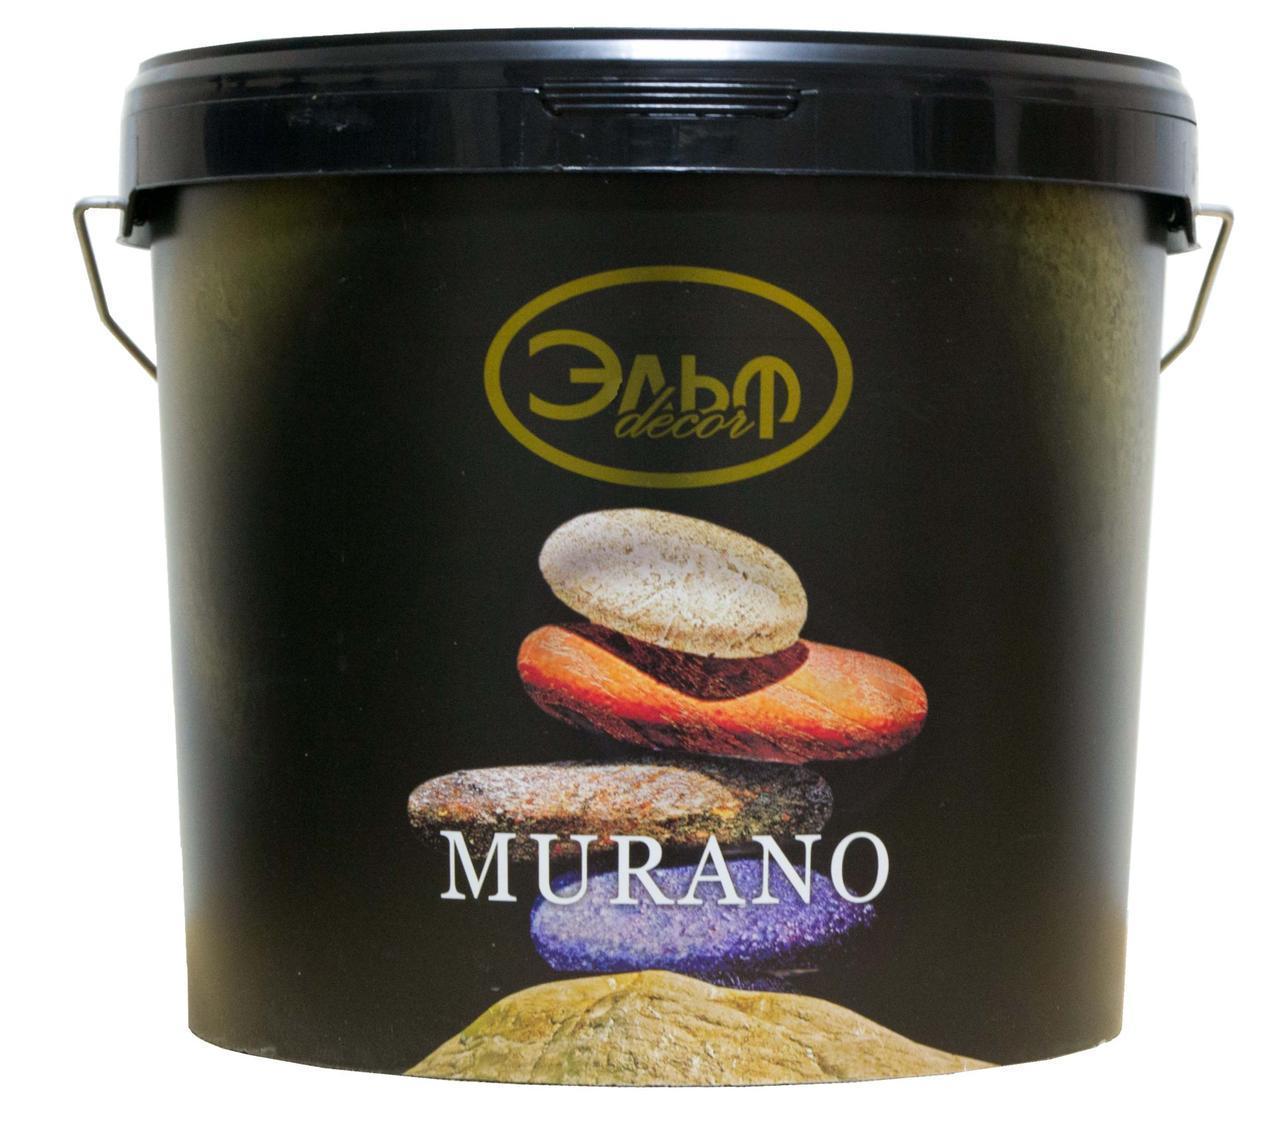 MURANO Pearl (Мурано), Эльф, венецианская штукатурка, 1кг